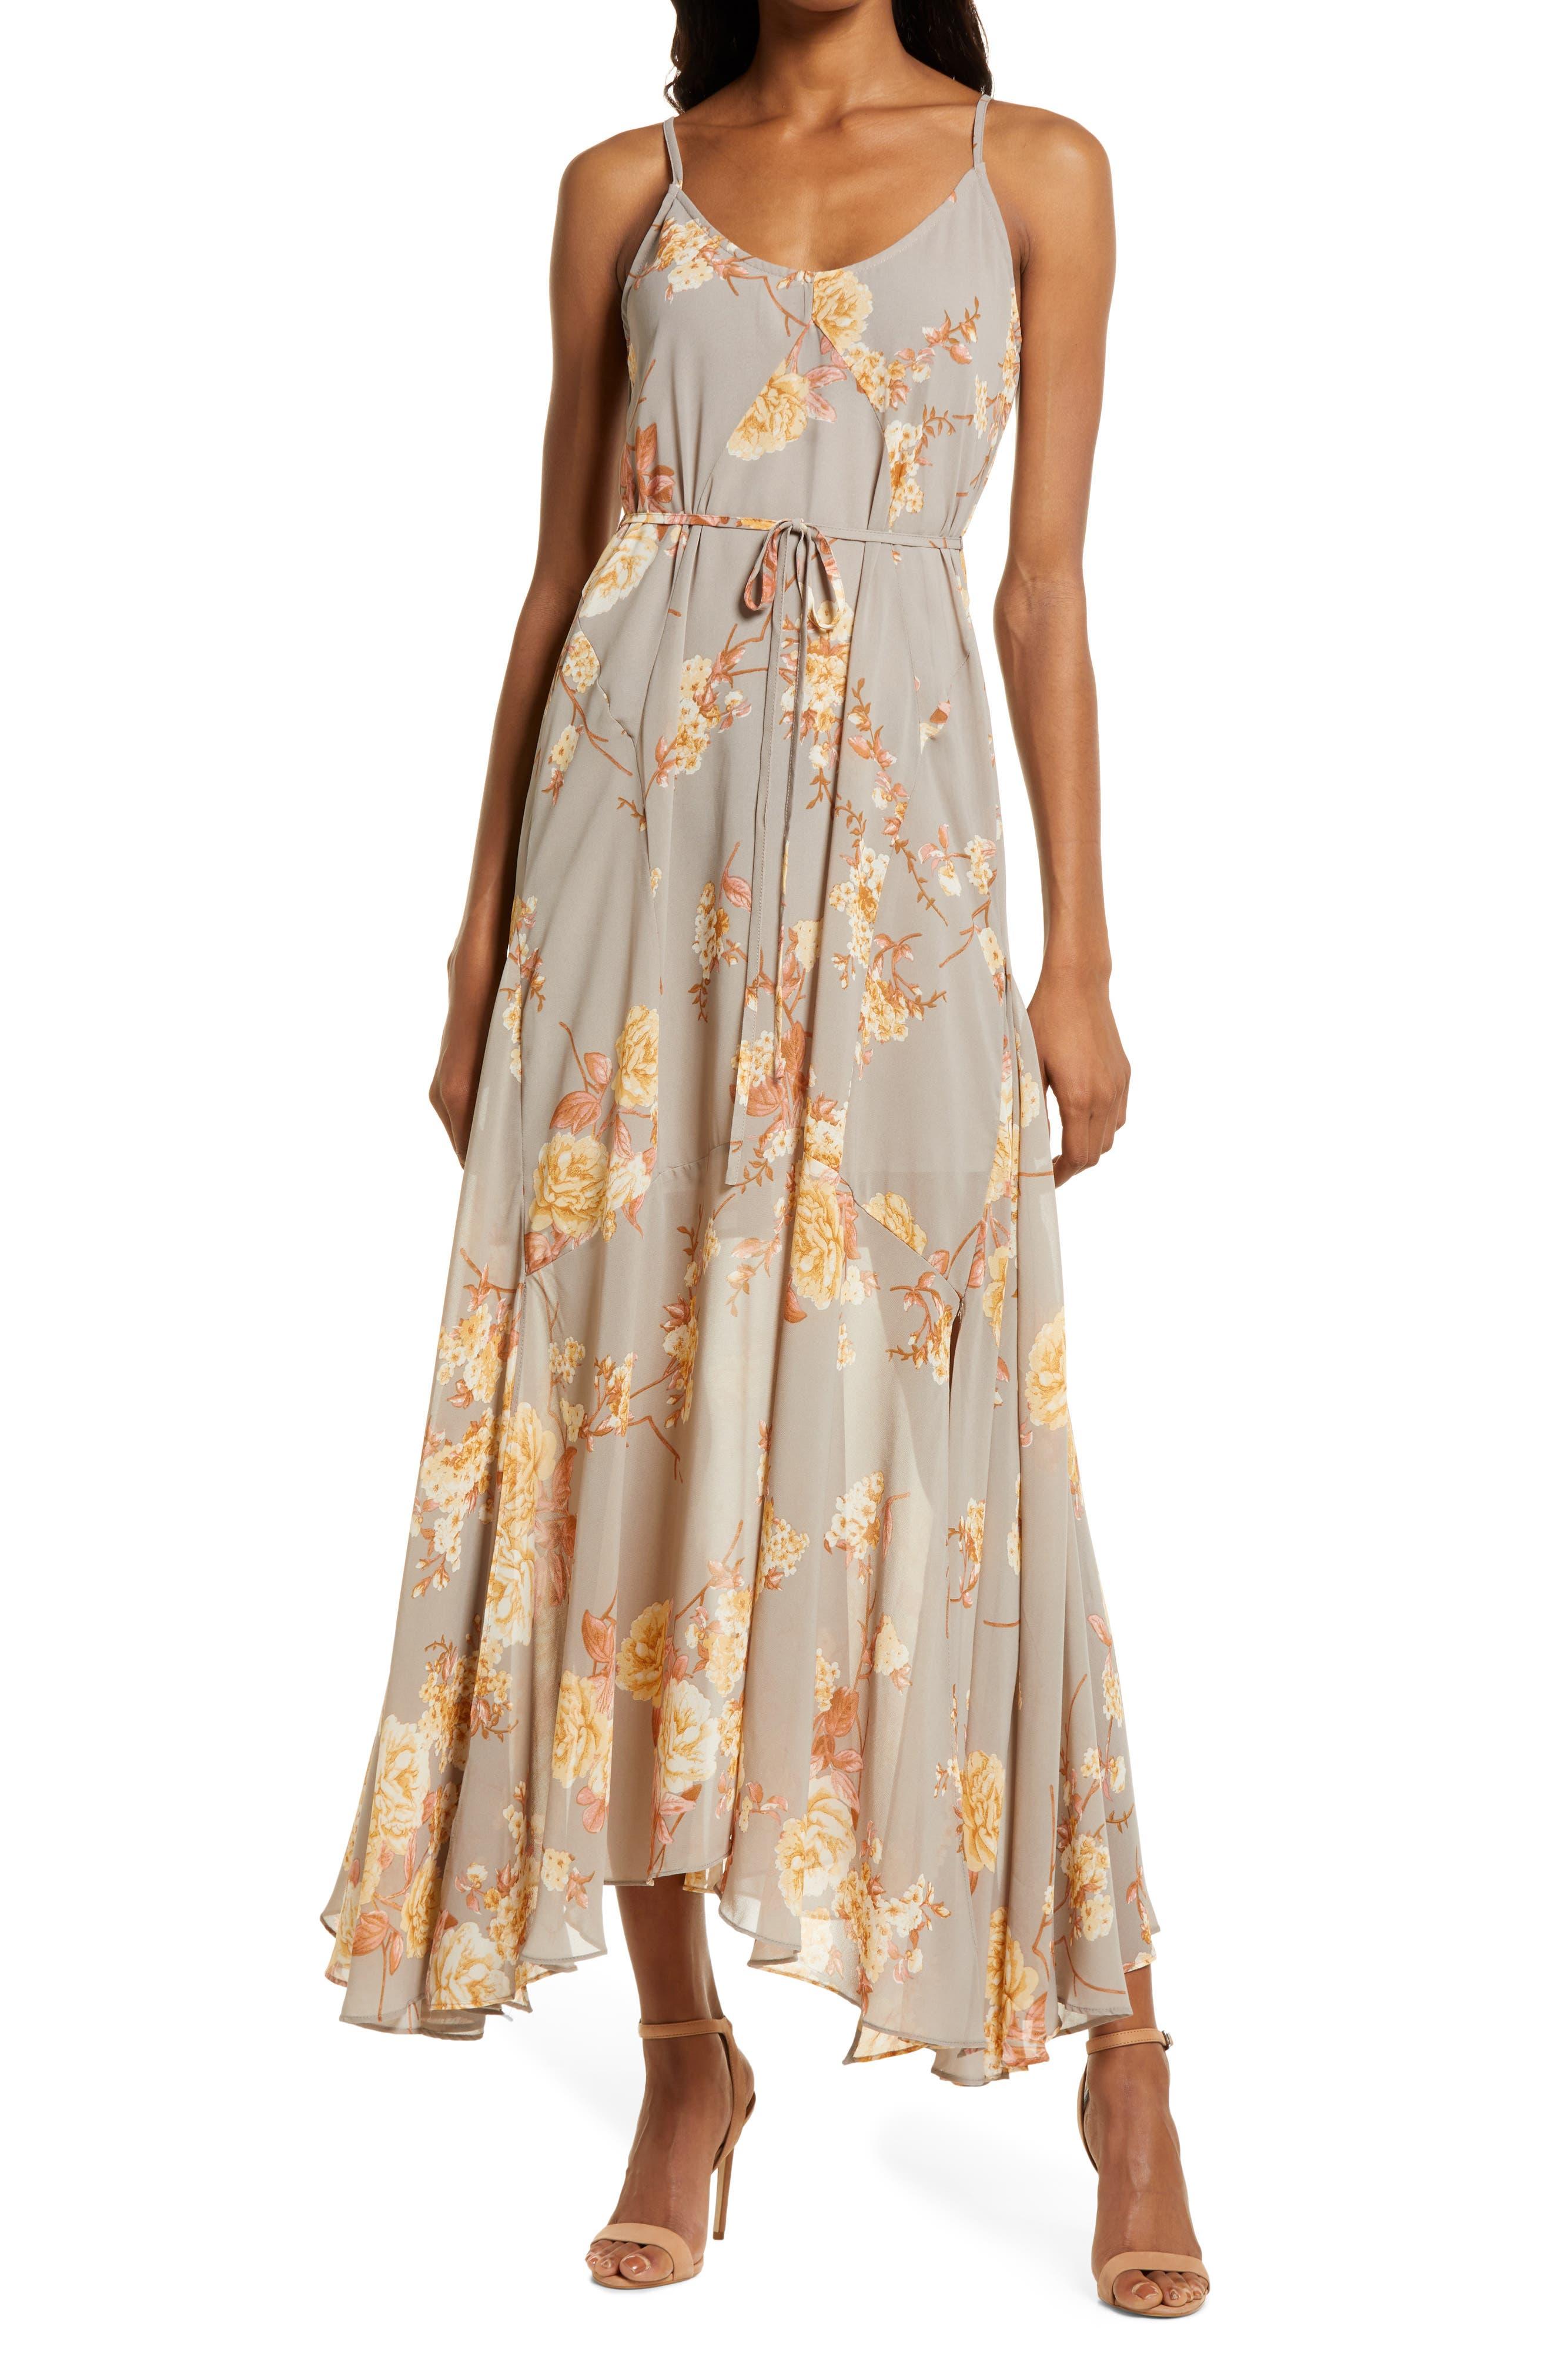 Feeling Freesia Floral Dress